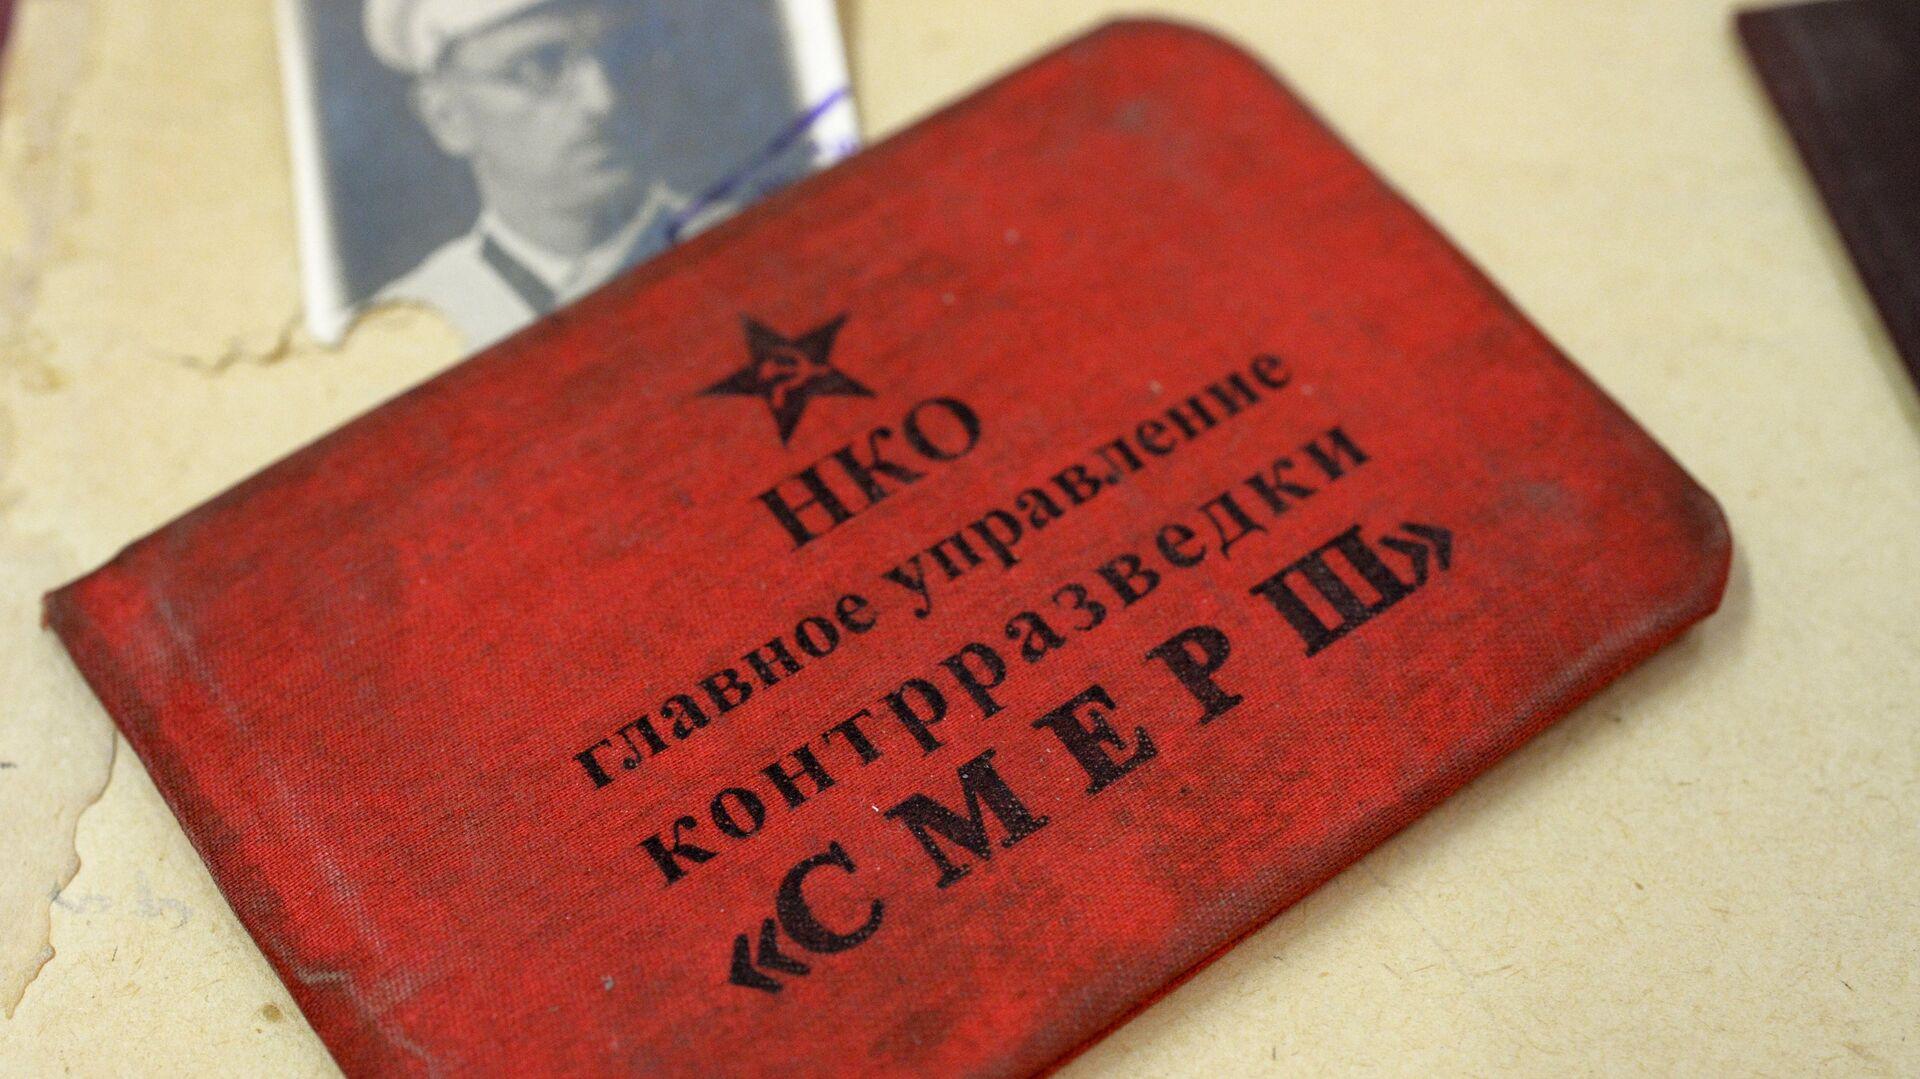 Удостоверение Смерш на антикварном салоне в Москве - РИА Новости, 1920, 03.12.2020